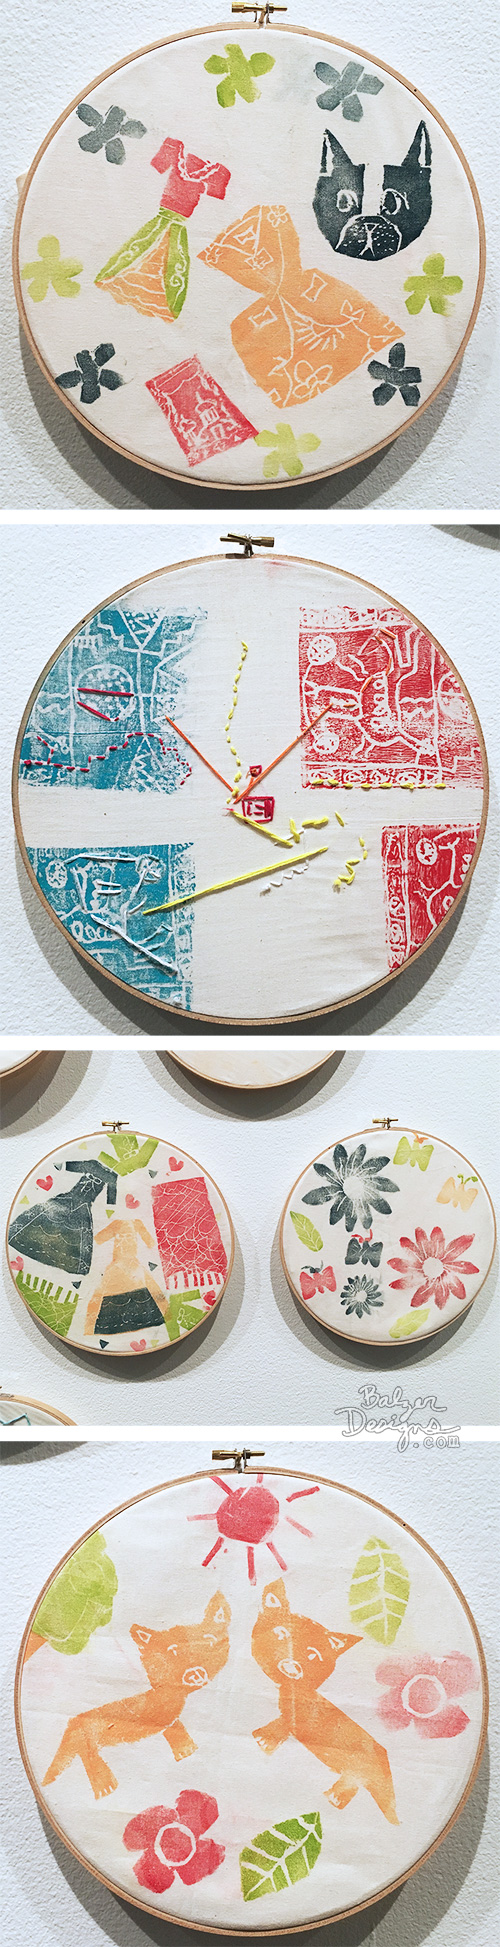 from the Balzer Designs Blog: Nagoya Boston Artwork Exchange